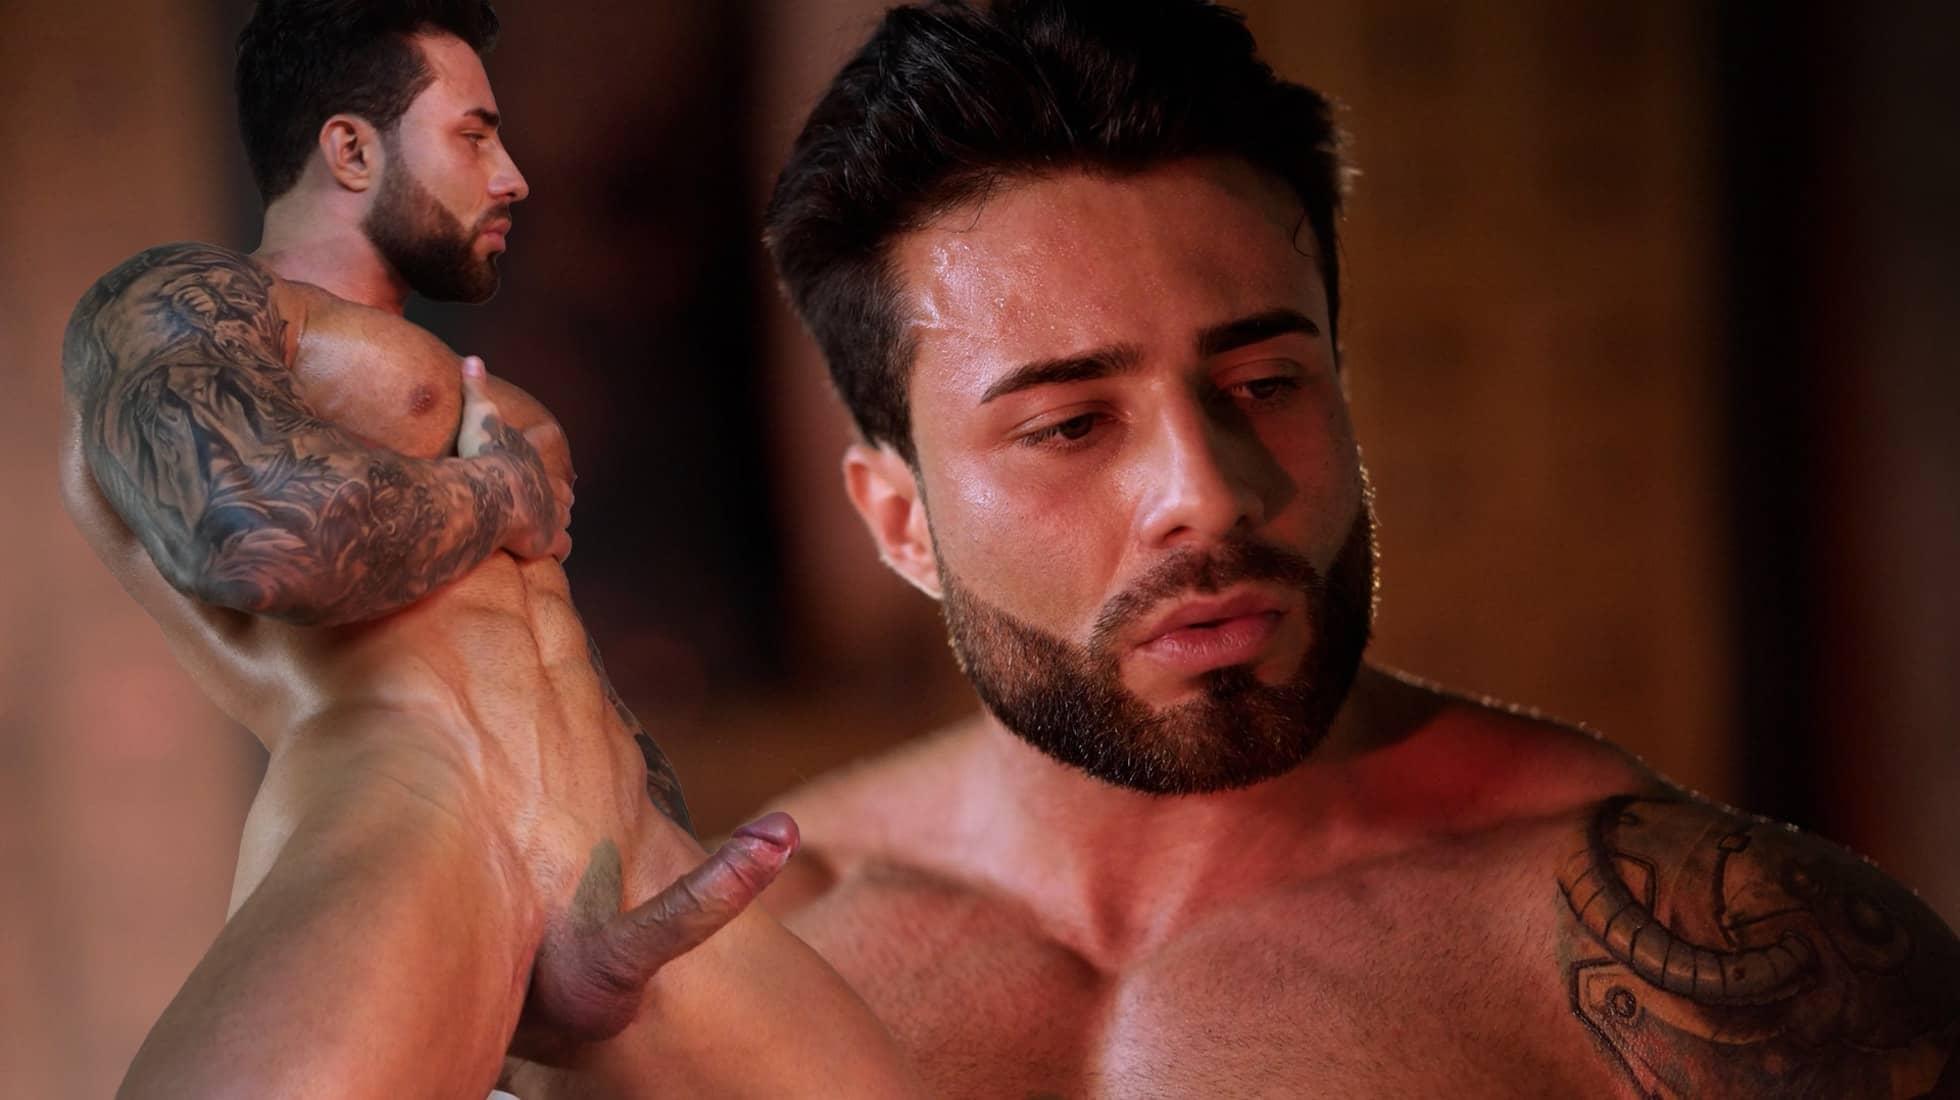 Naked Russian Bodybuilder 2, Maxim